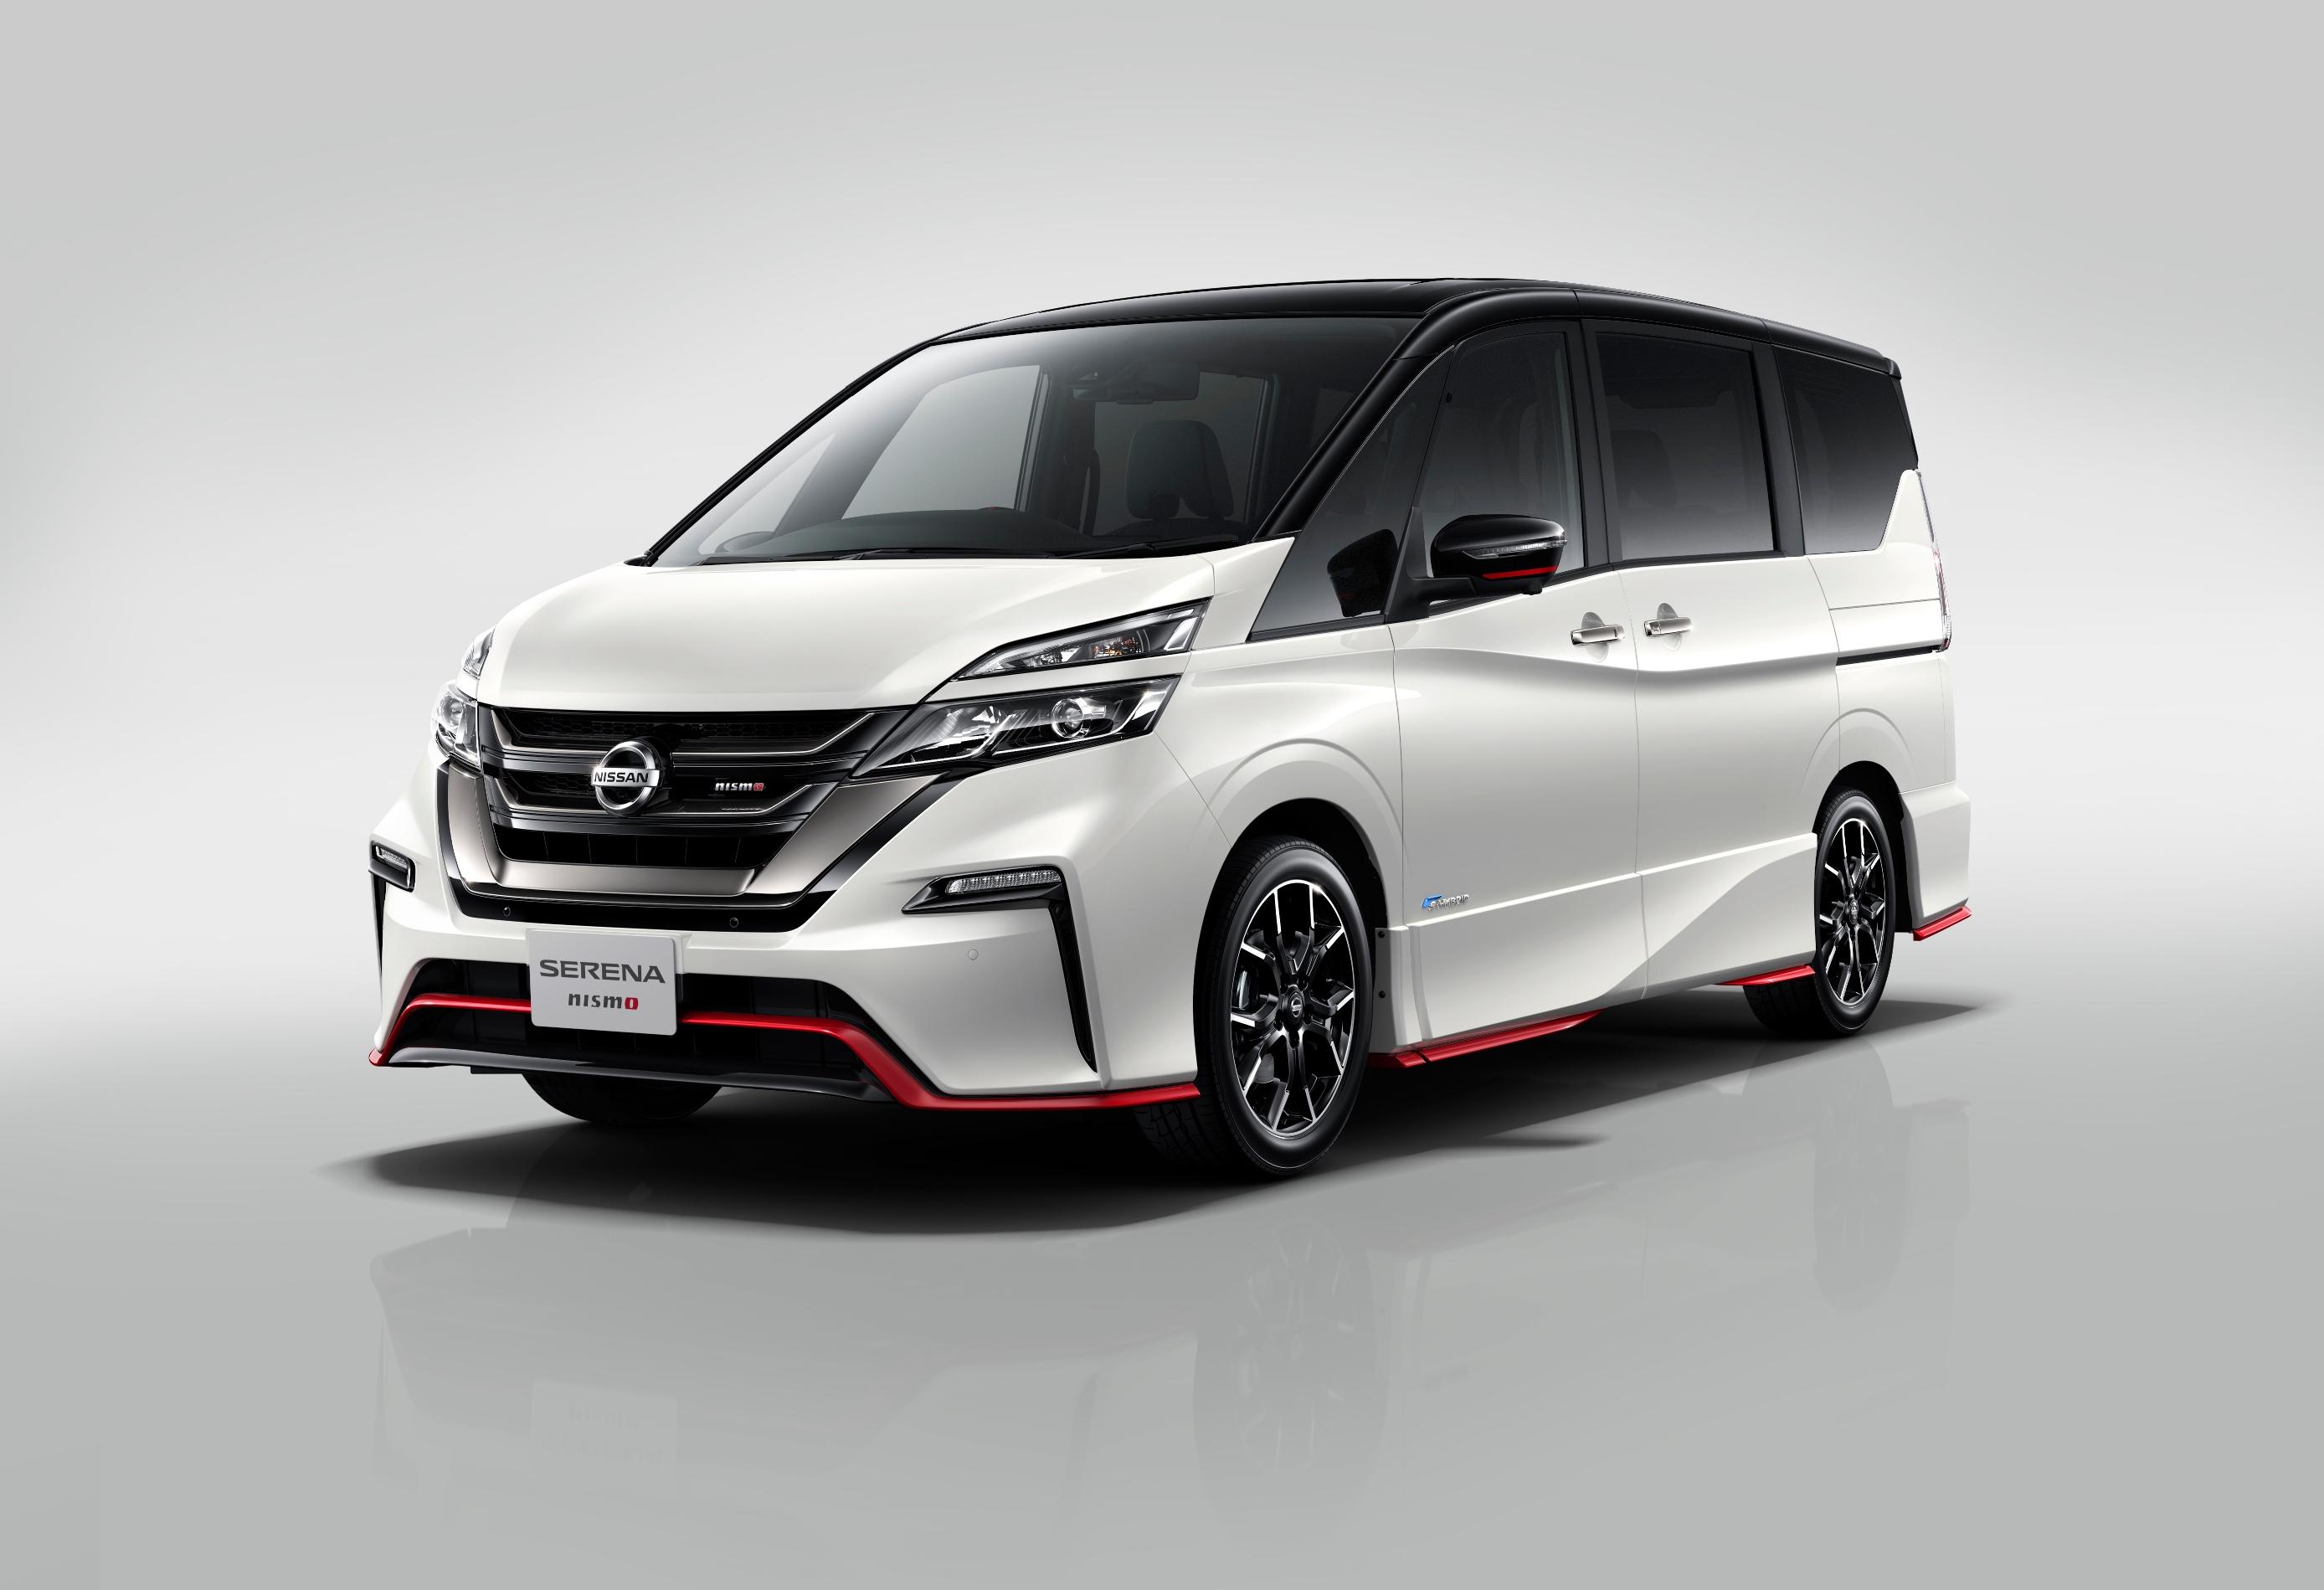 Nissan Serena Nismo Mobil Keluarga Sensasi Balap